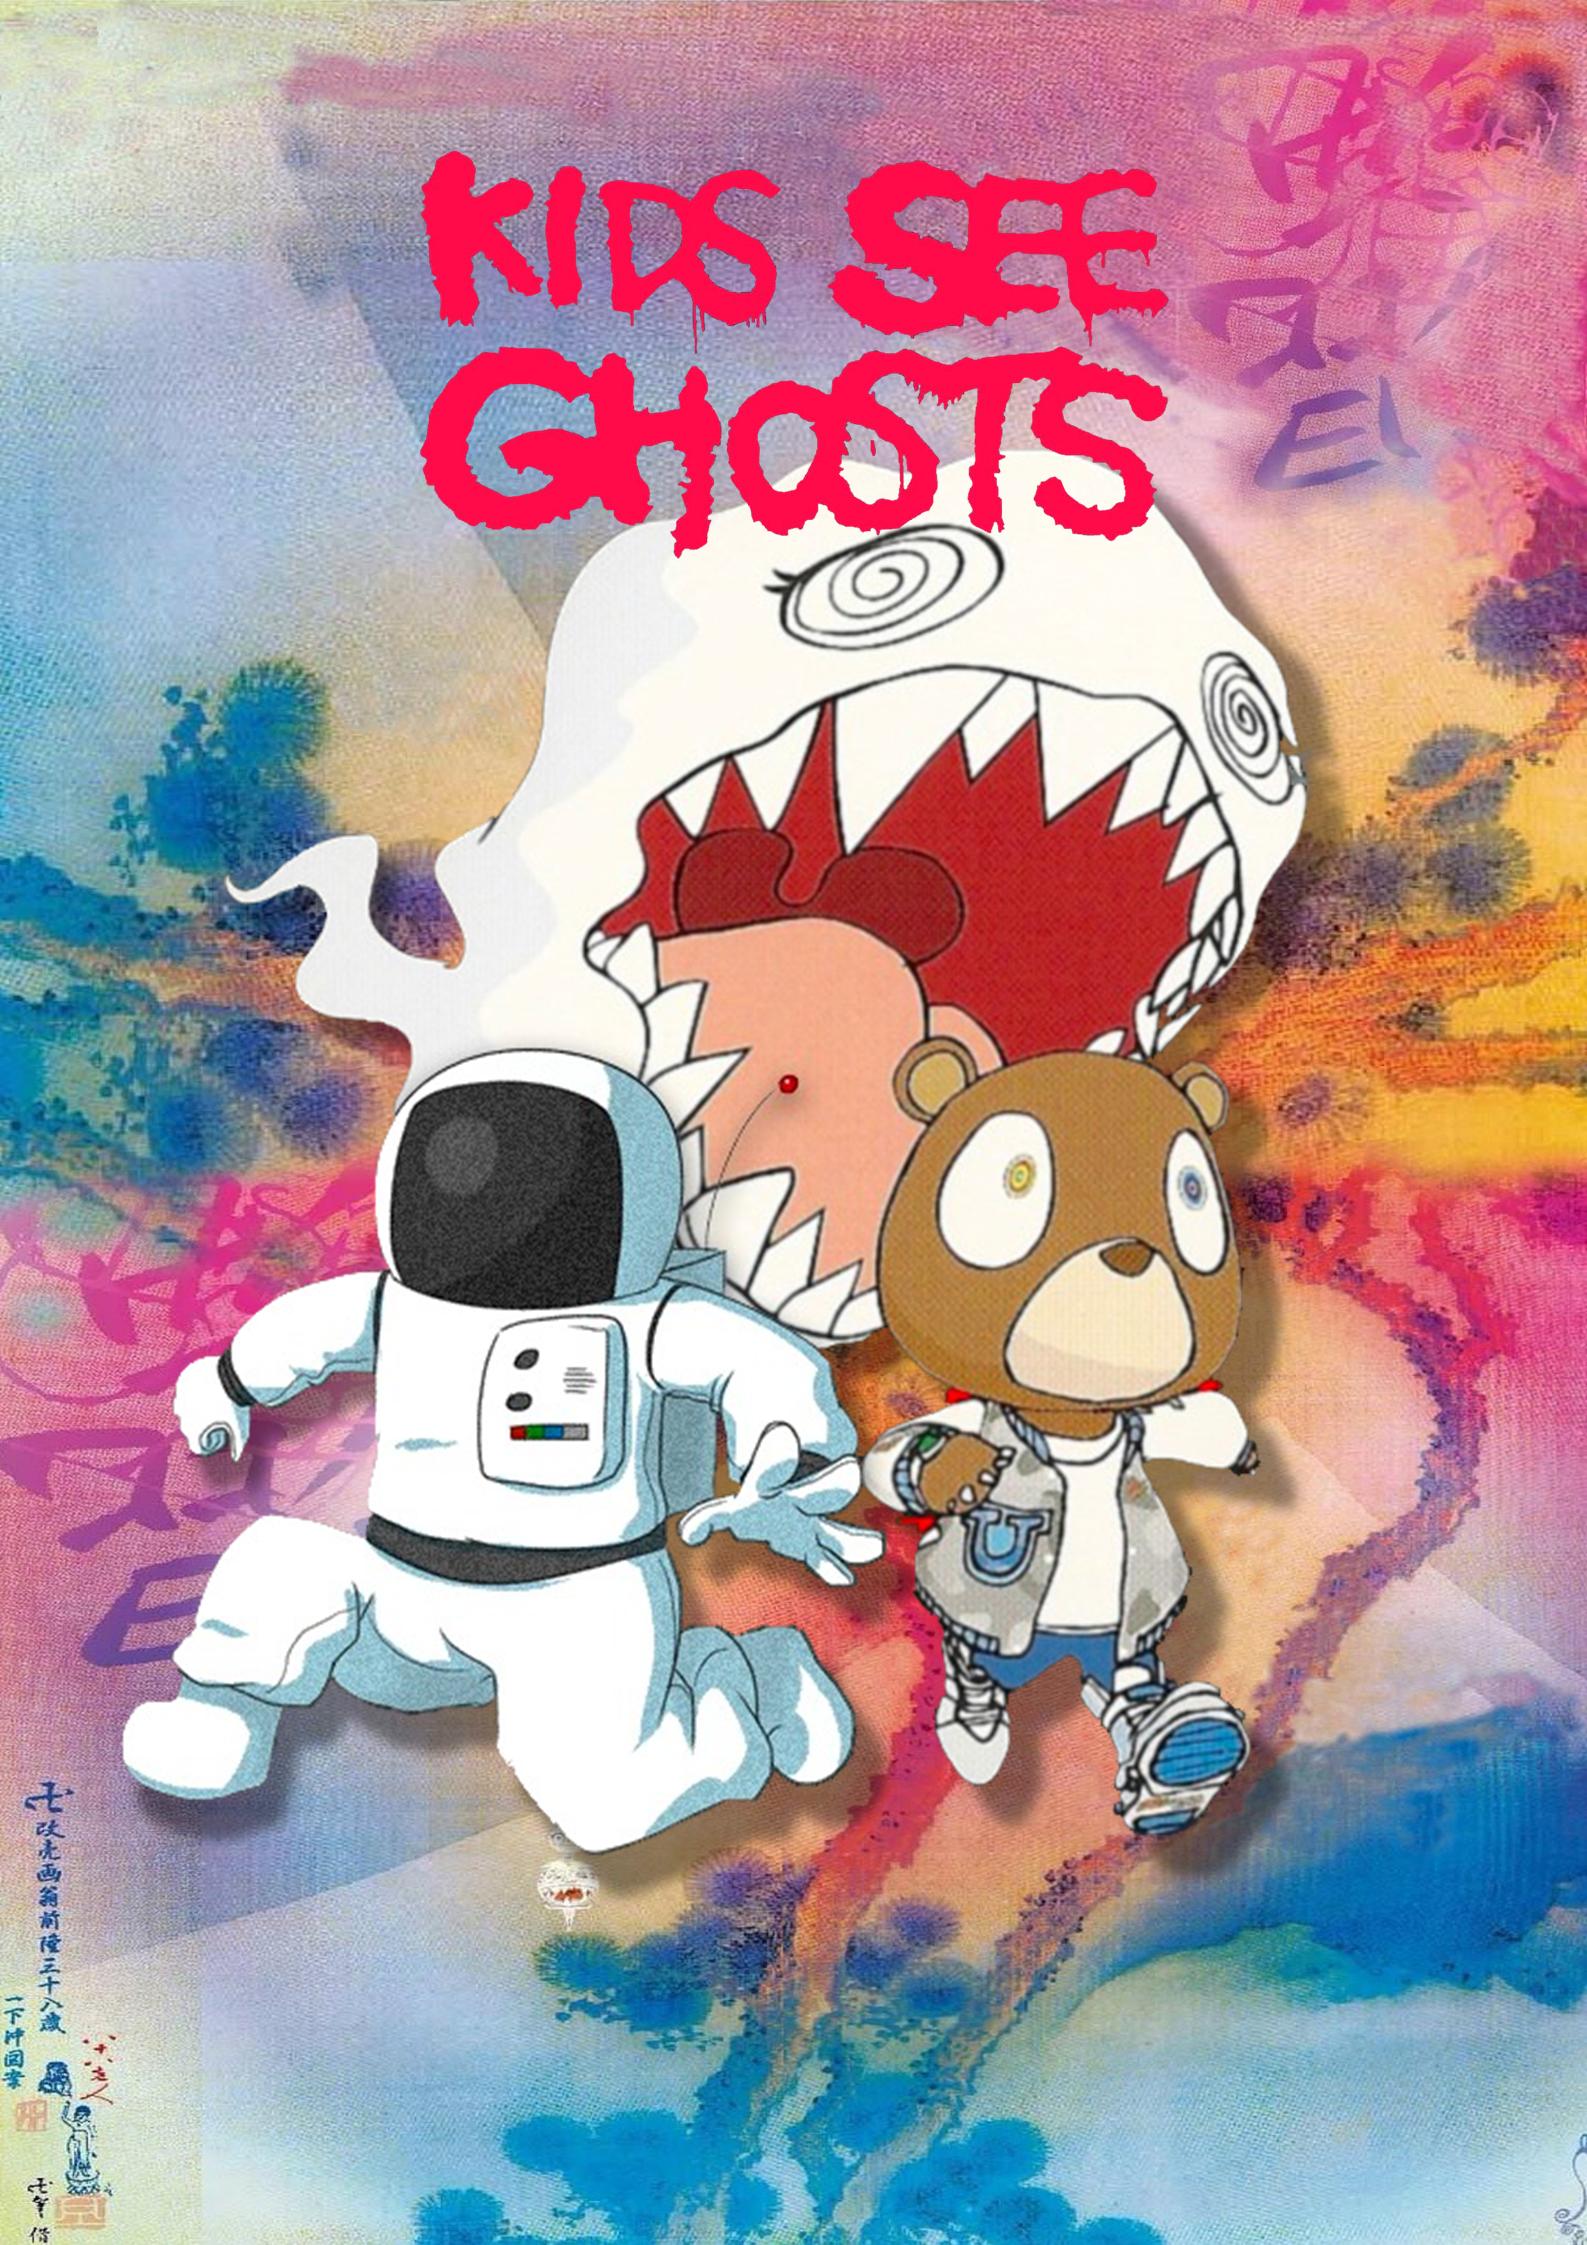 Kanye West And Kid Cudi Kids See Ghosts Poster Etsy Kid Cudi Poster Kid Cudi Wallpaper Kid Cudi